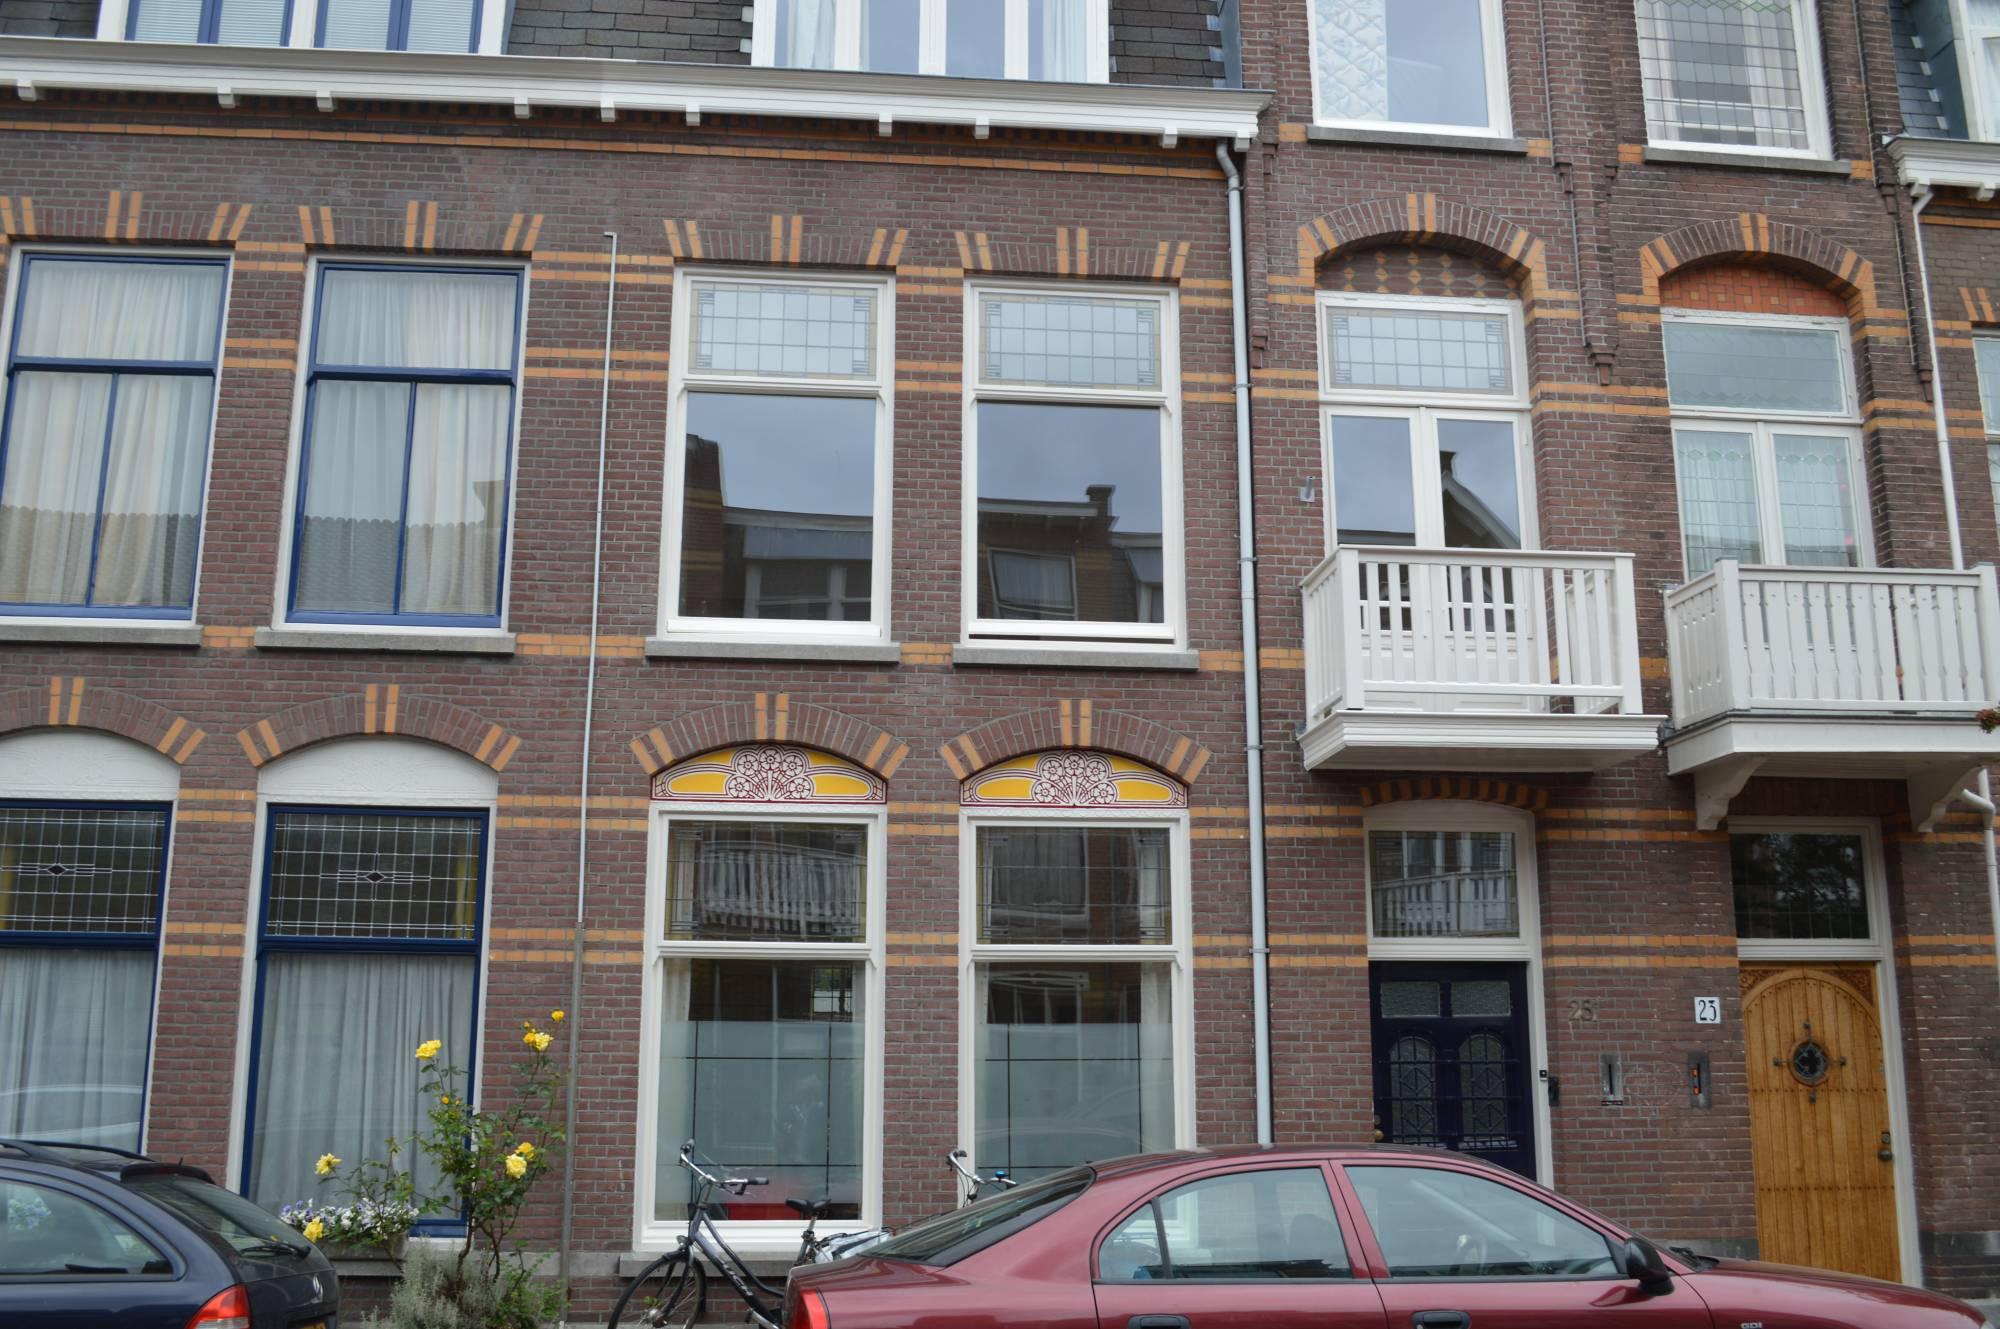 https://public.parariusoffice.nl/185/photos/huge/3122689.1559912824-243.JPG